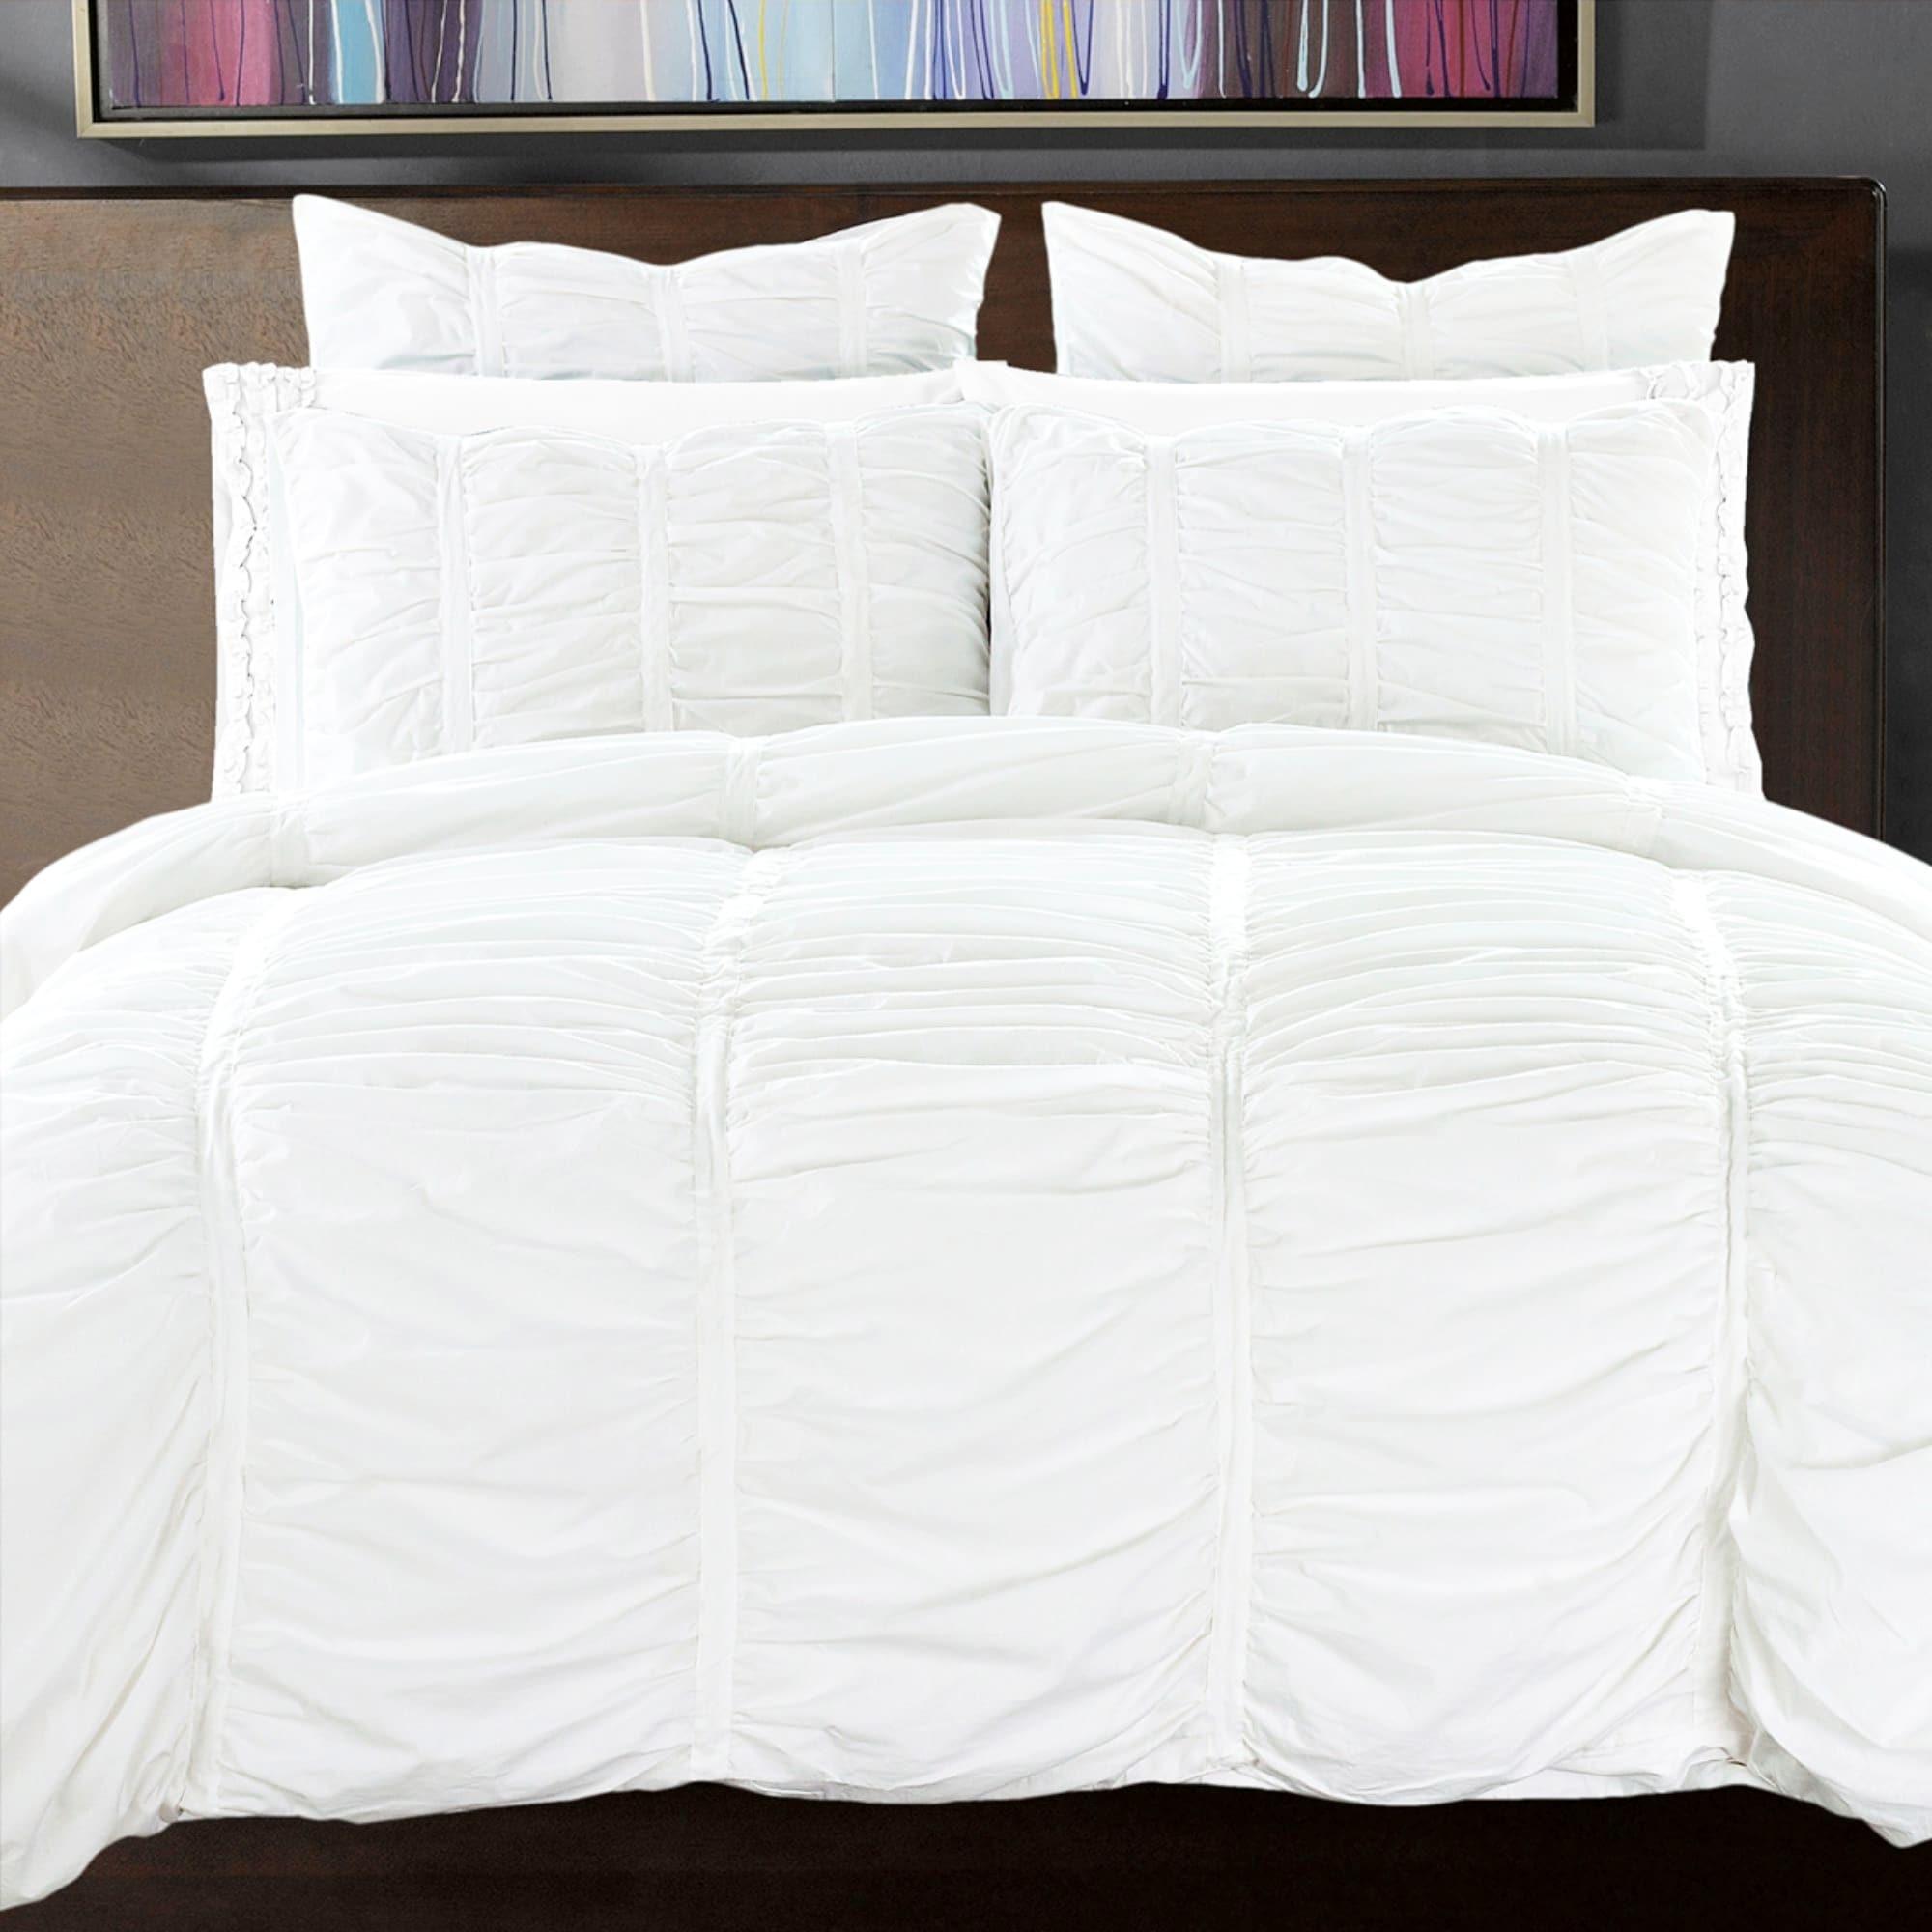 Ordinaire California Design Den Cotton Ruffled Handcrafted Duvet Cover Set